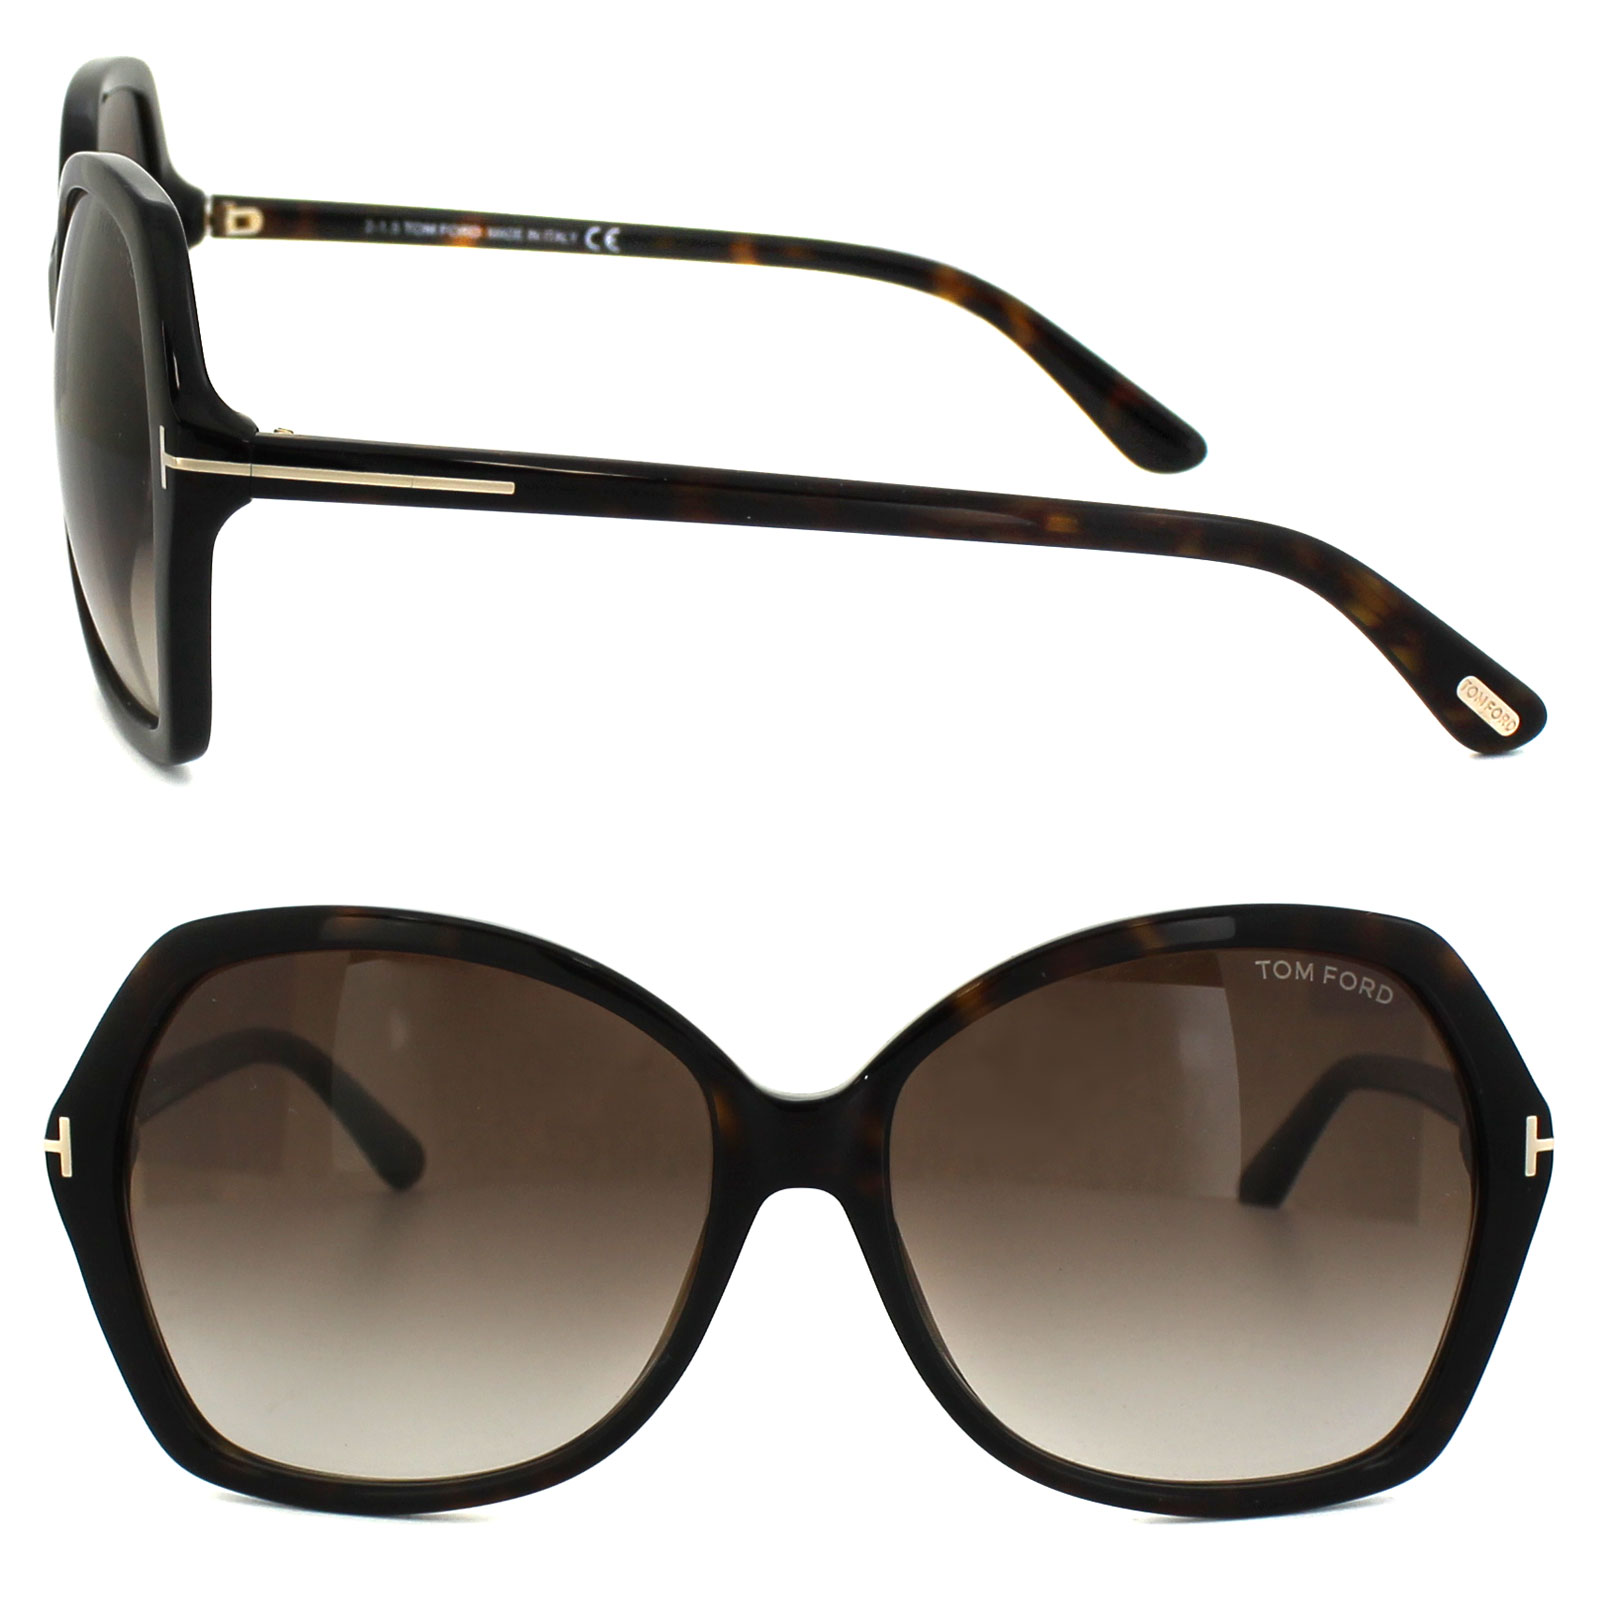 0e9ad4dfa70b Sentinel Tom Ford Sunglasses 0328 Carola 52F Dark Havana Brown Gradient